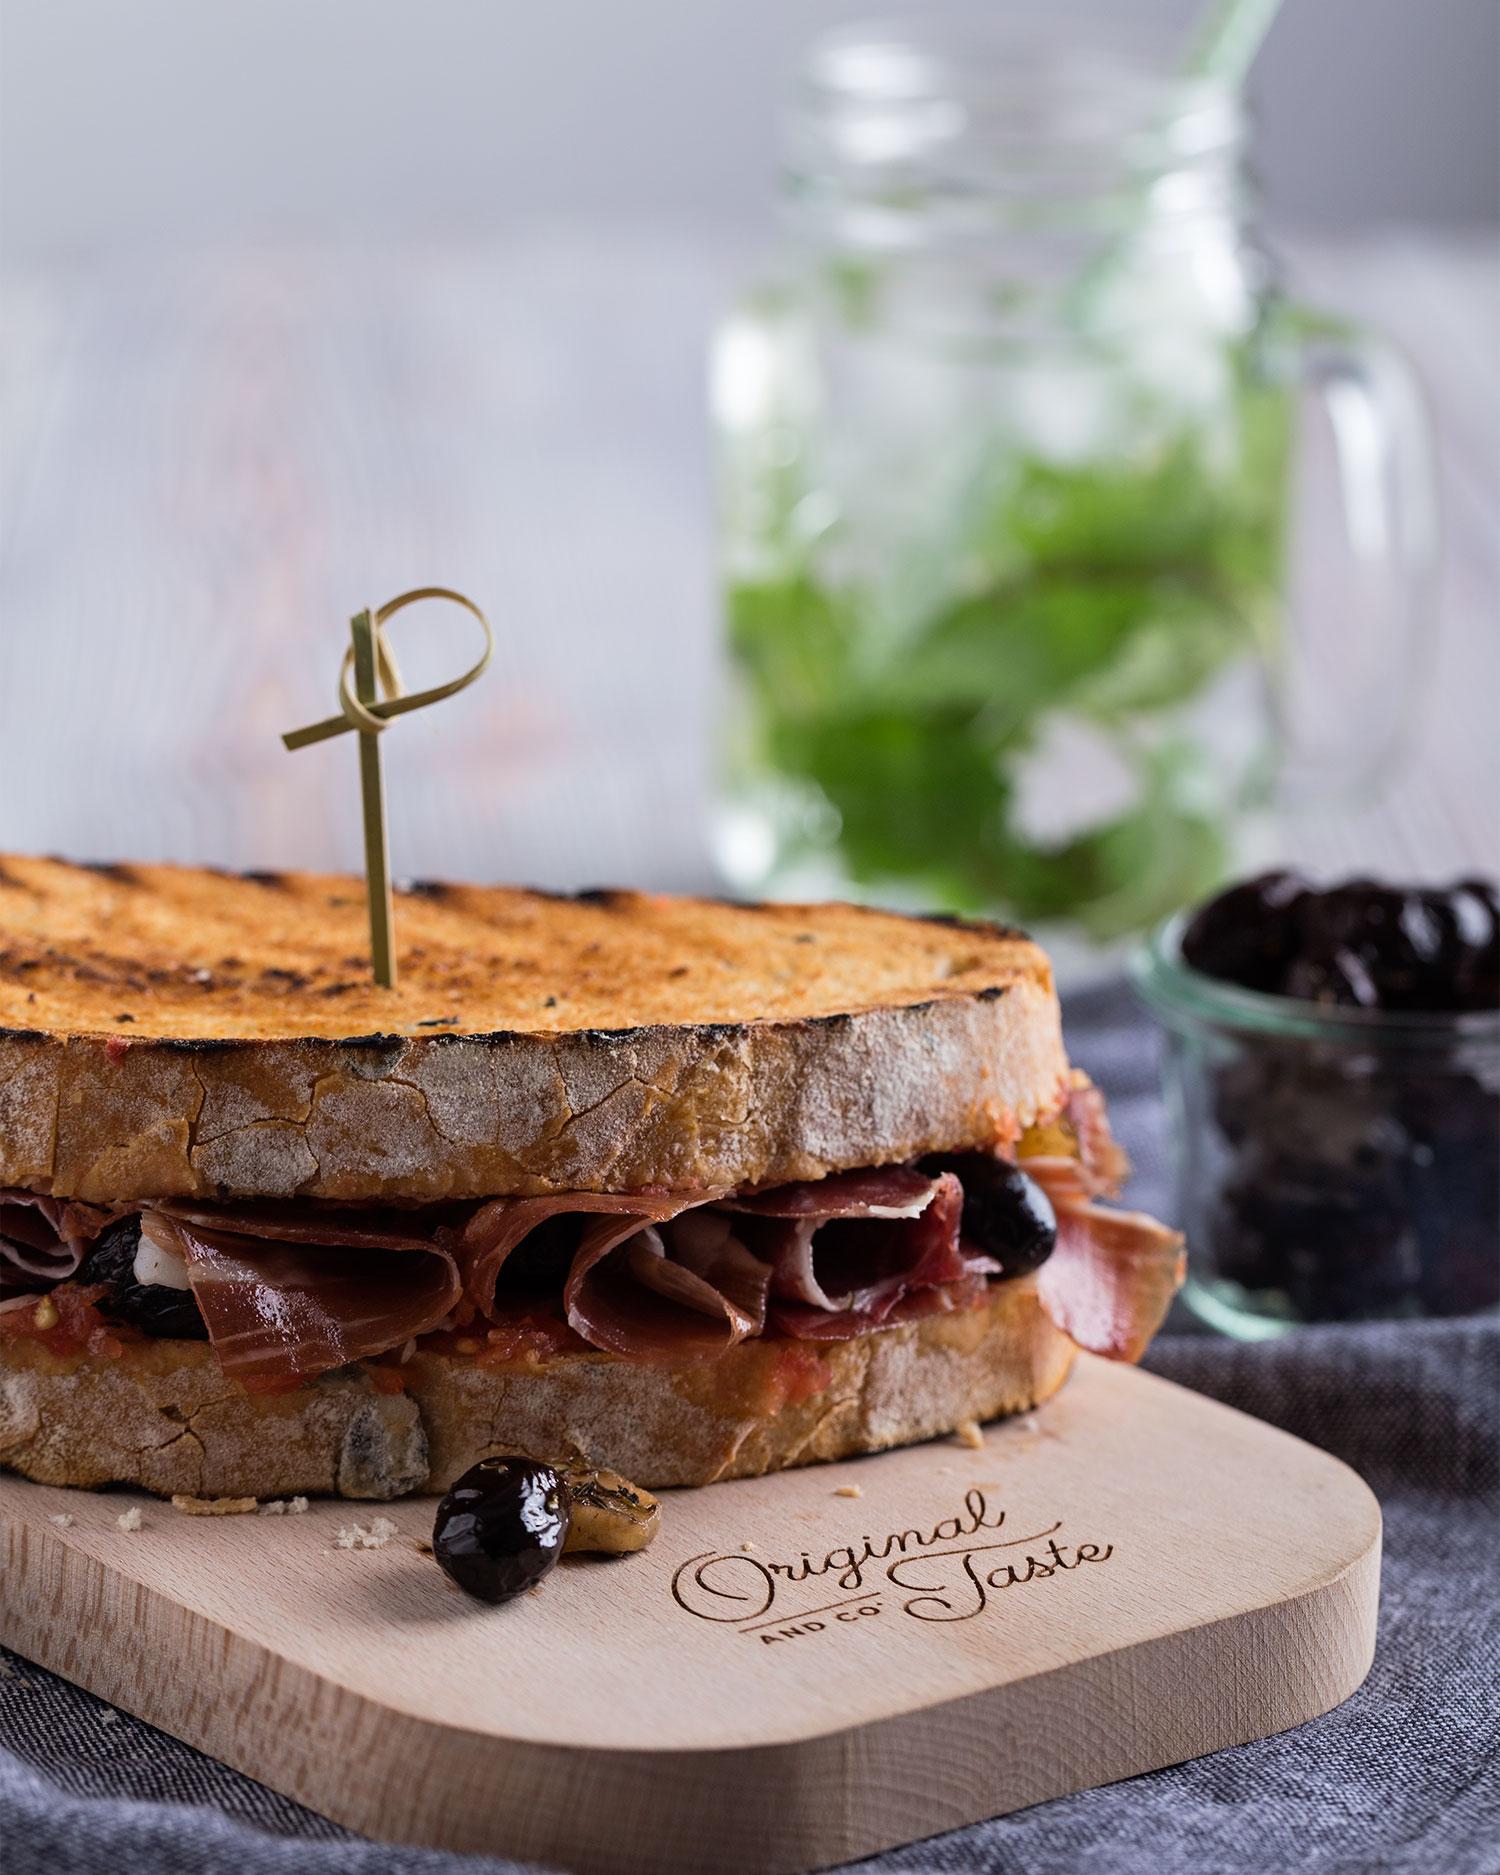 corina-landa-food-photography-fotografia-gastronomica-33.jpg